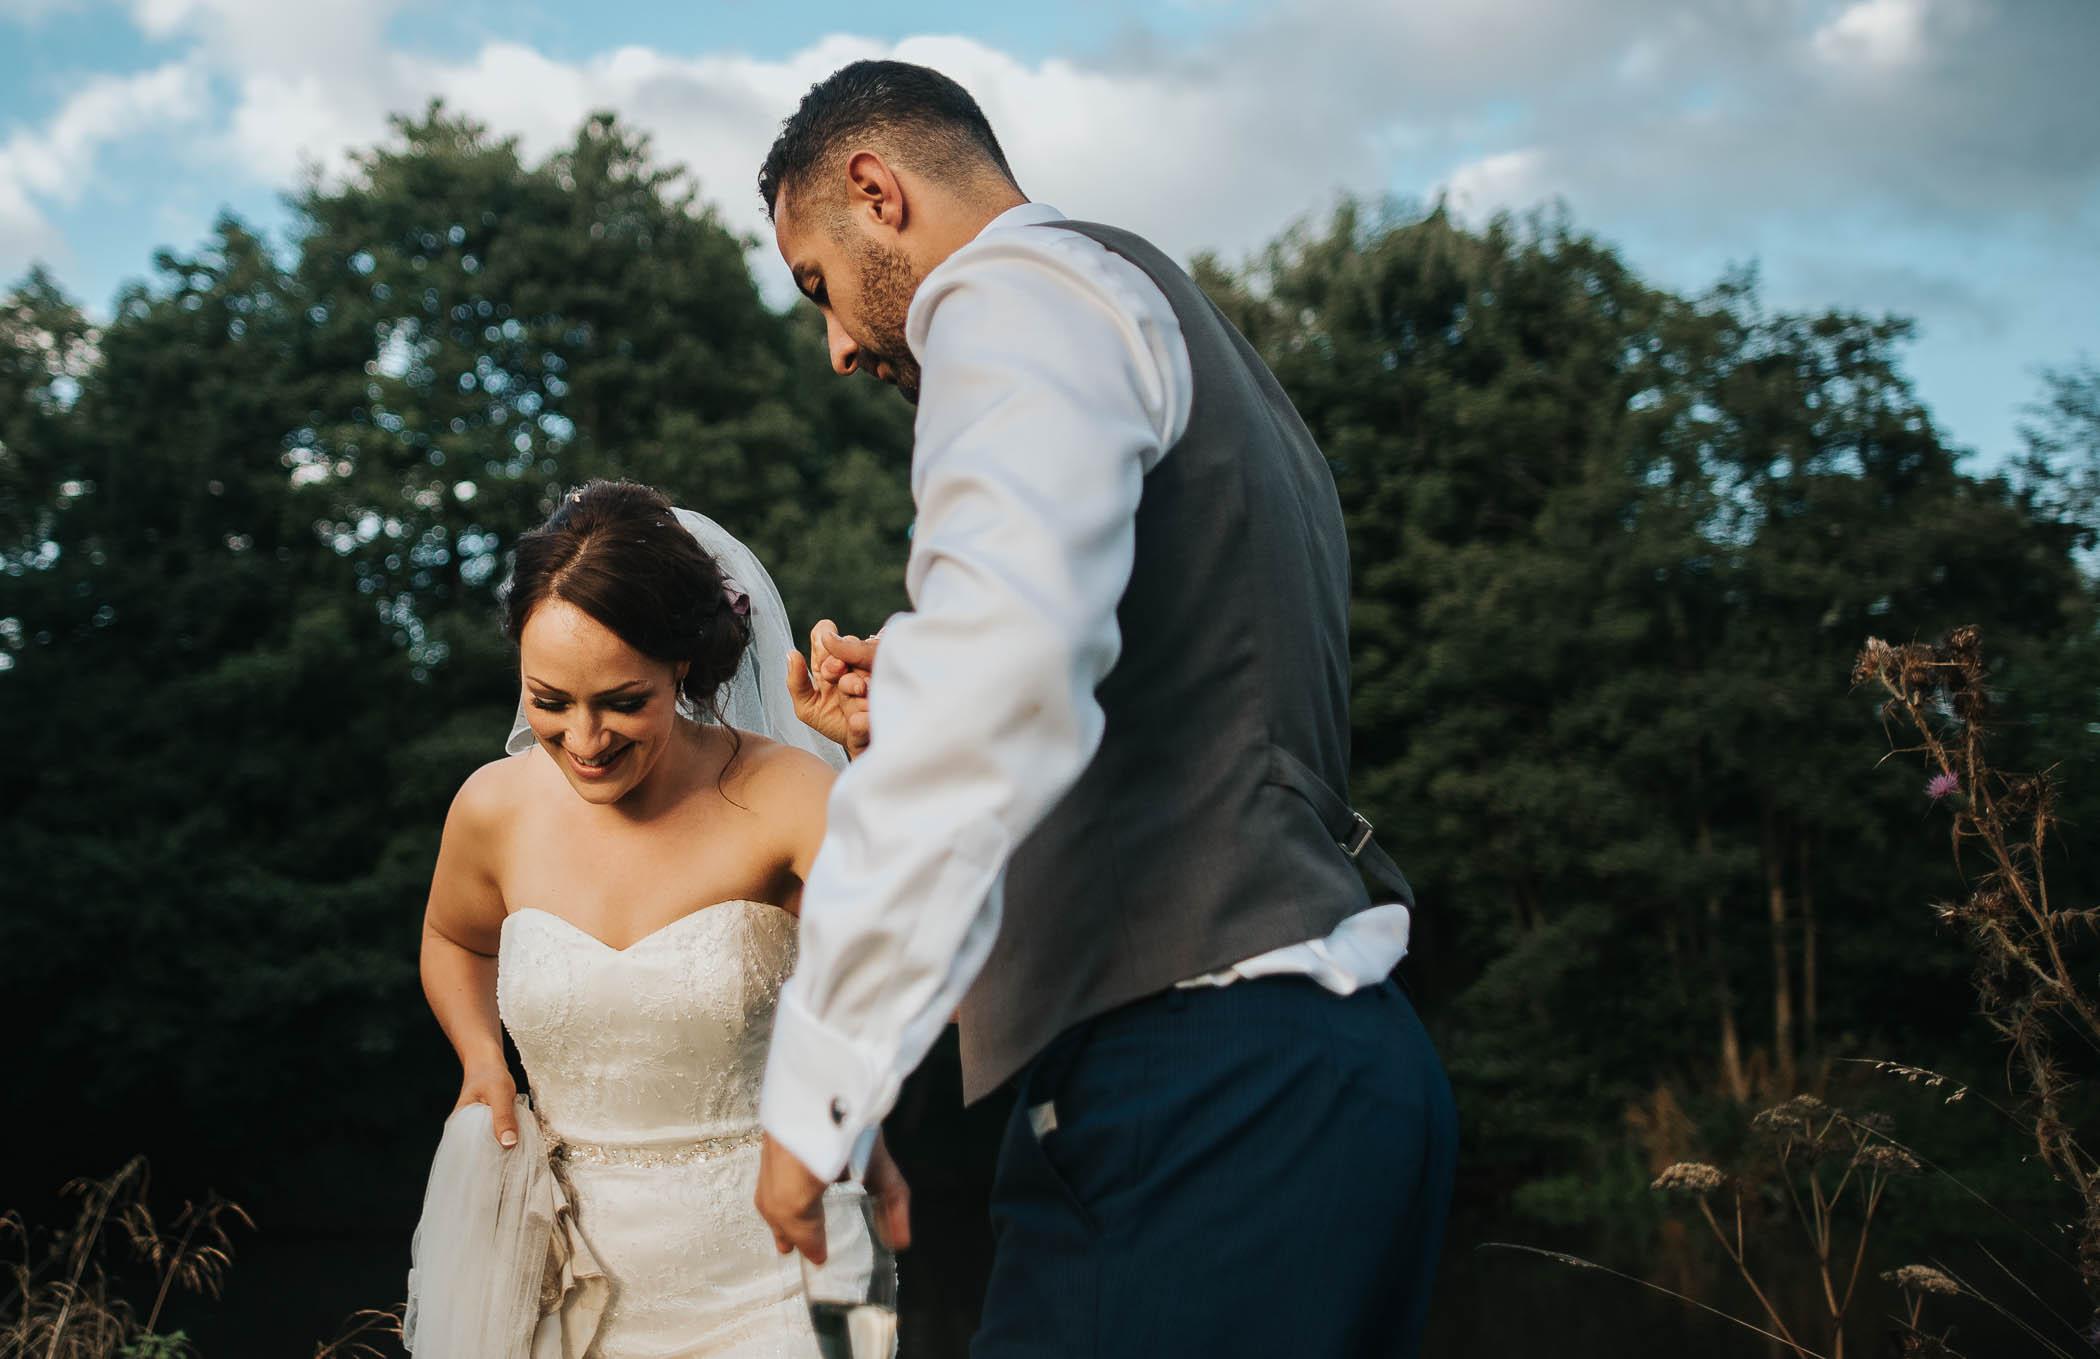 Dewsall Court Weddings